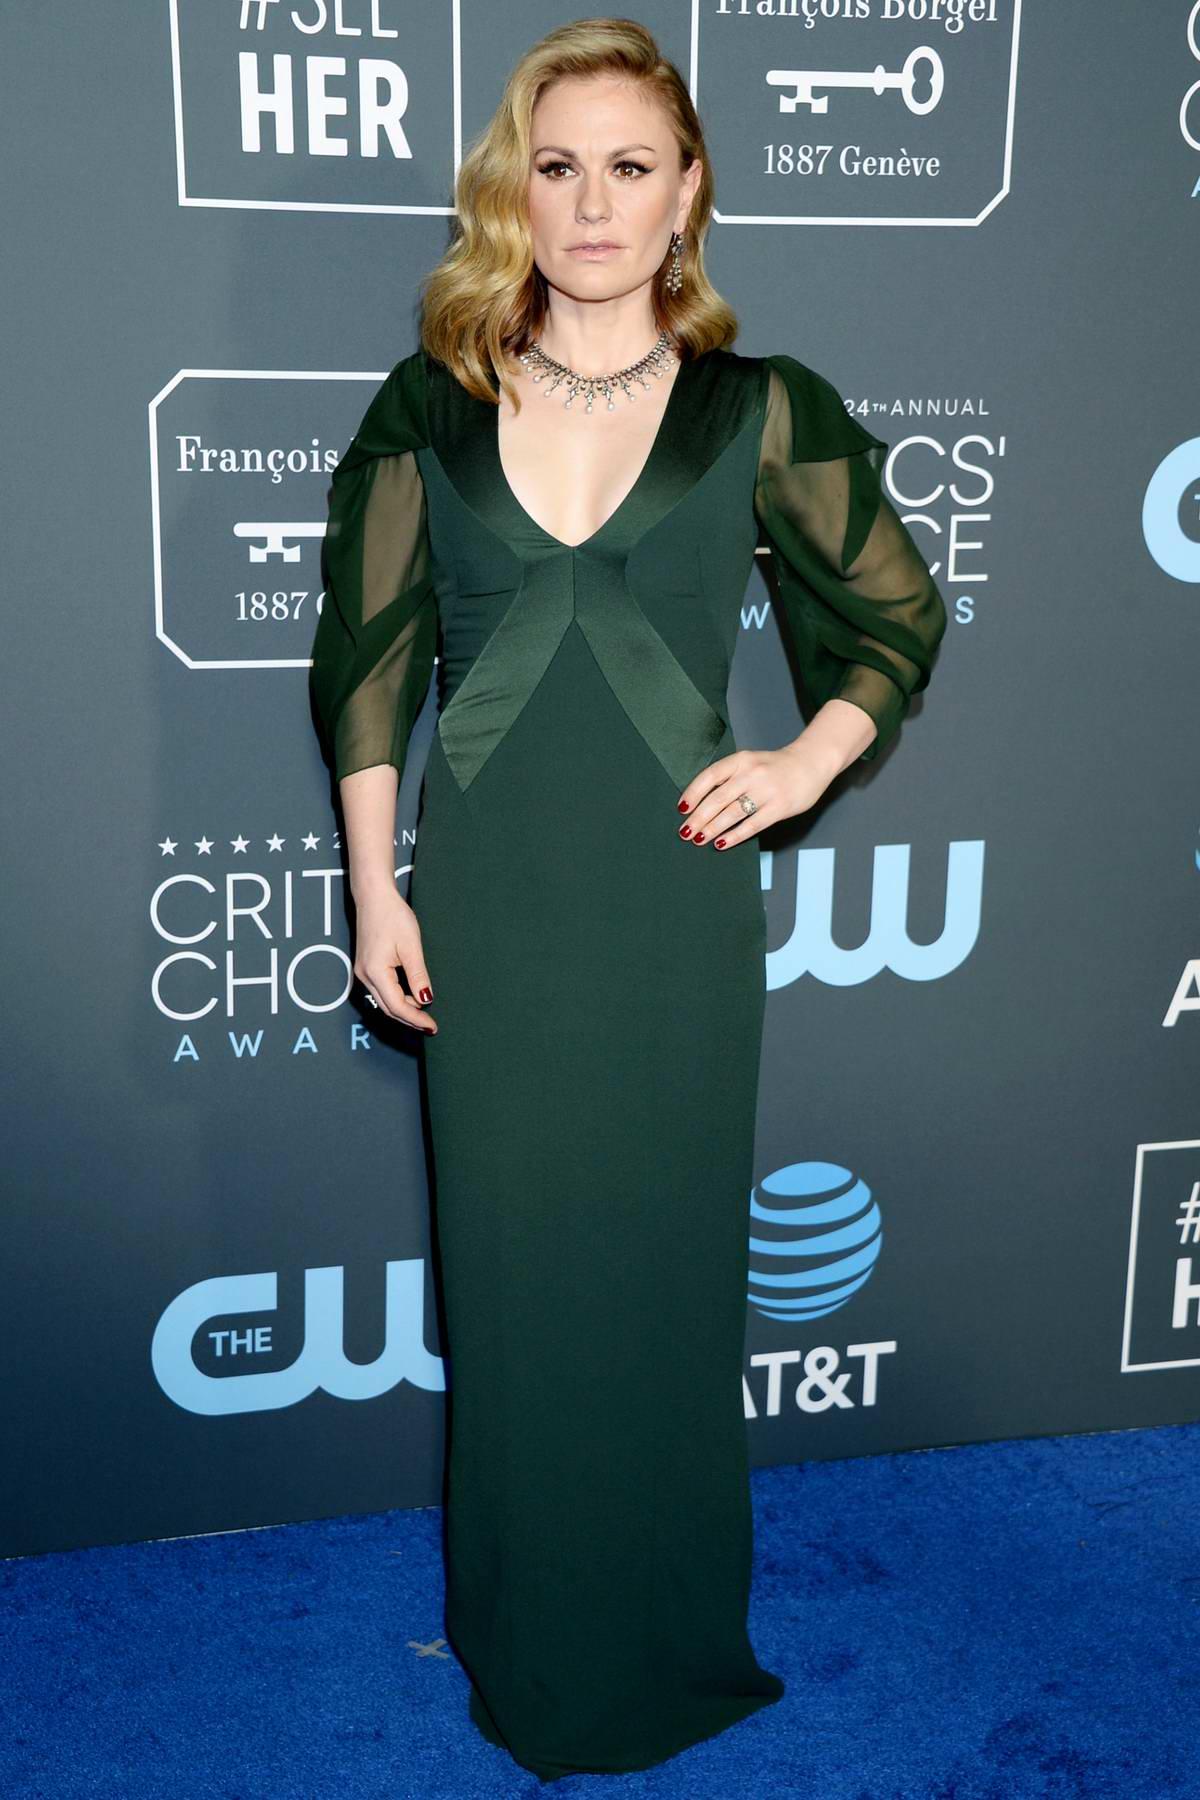 Anna Paquin attends the 24th Annual Critics' Choice Awards at Barker Hangar in Santa Monica, California